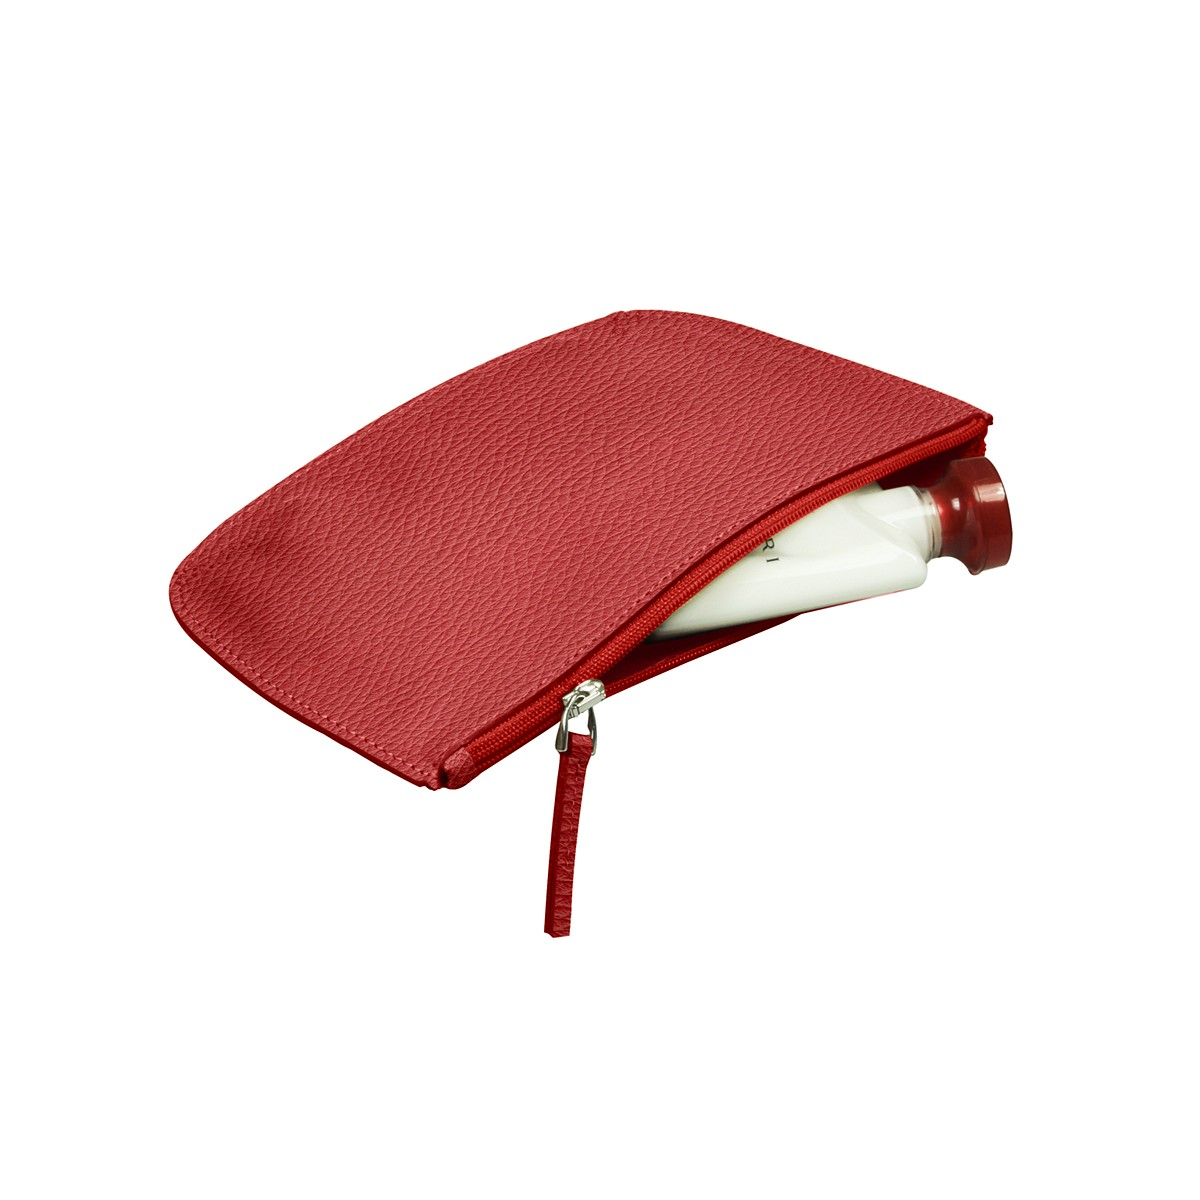 Rounded zippered flat case